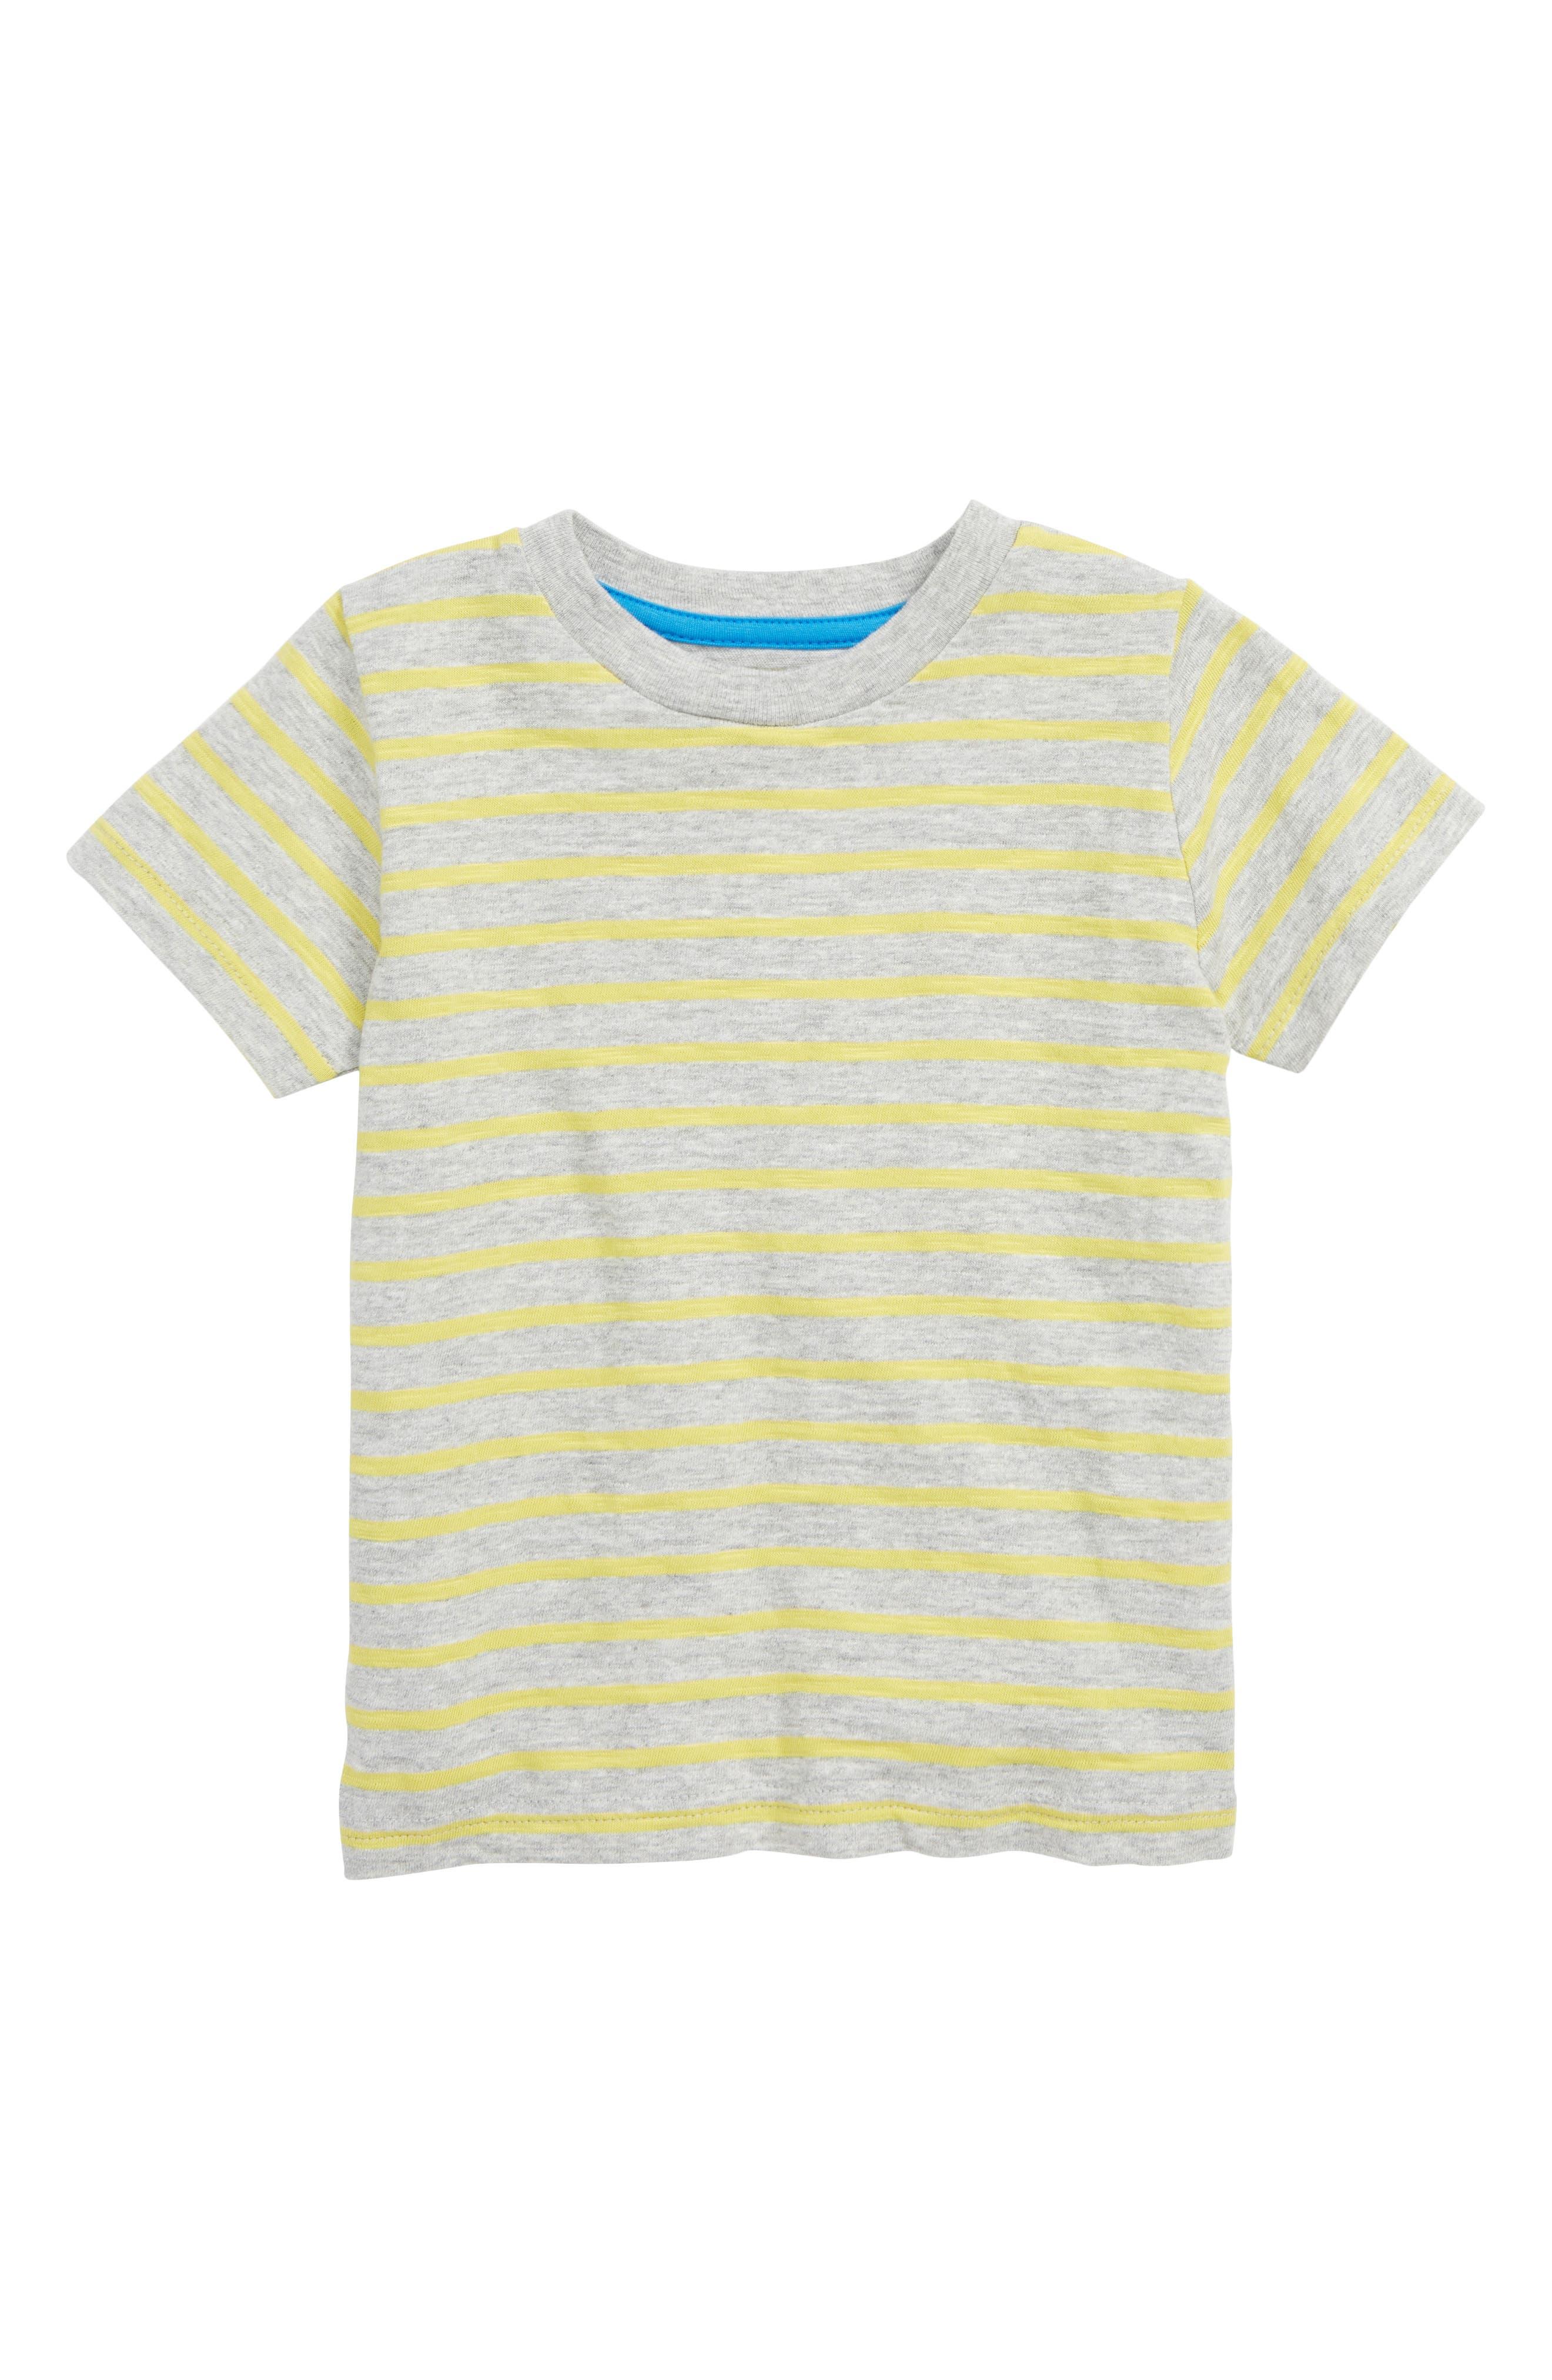 Boys Mini Boden Stripe Slub Knit TShirt Size 56Y  Orange